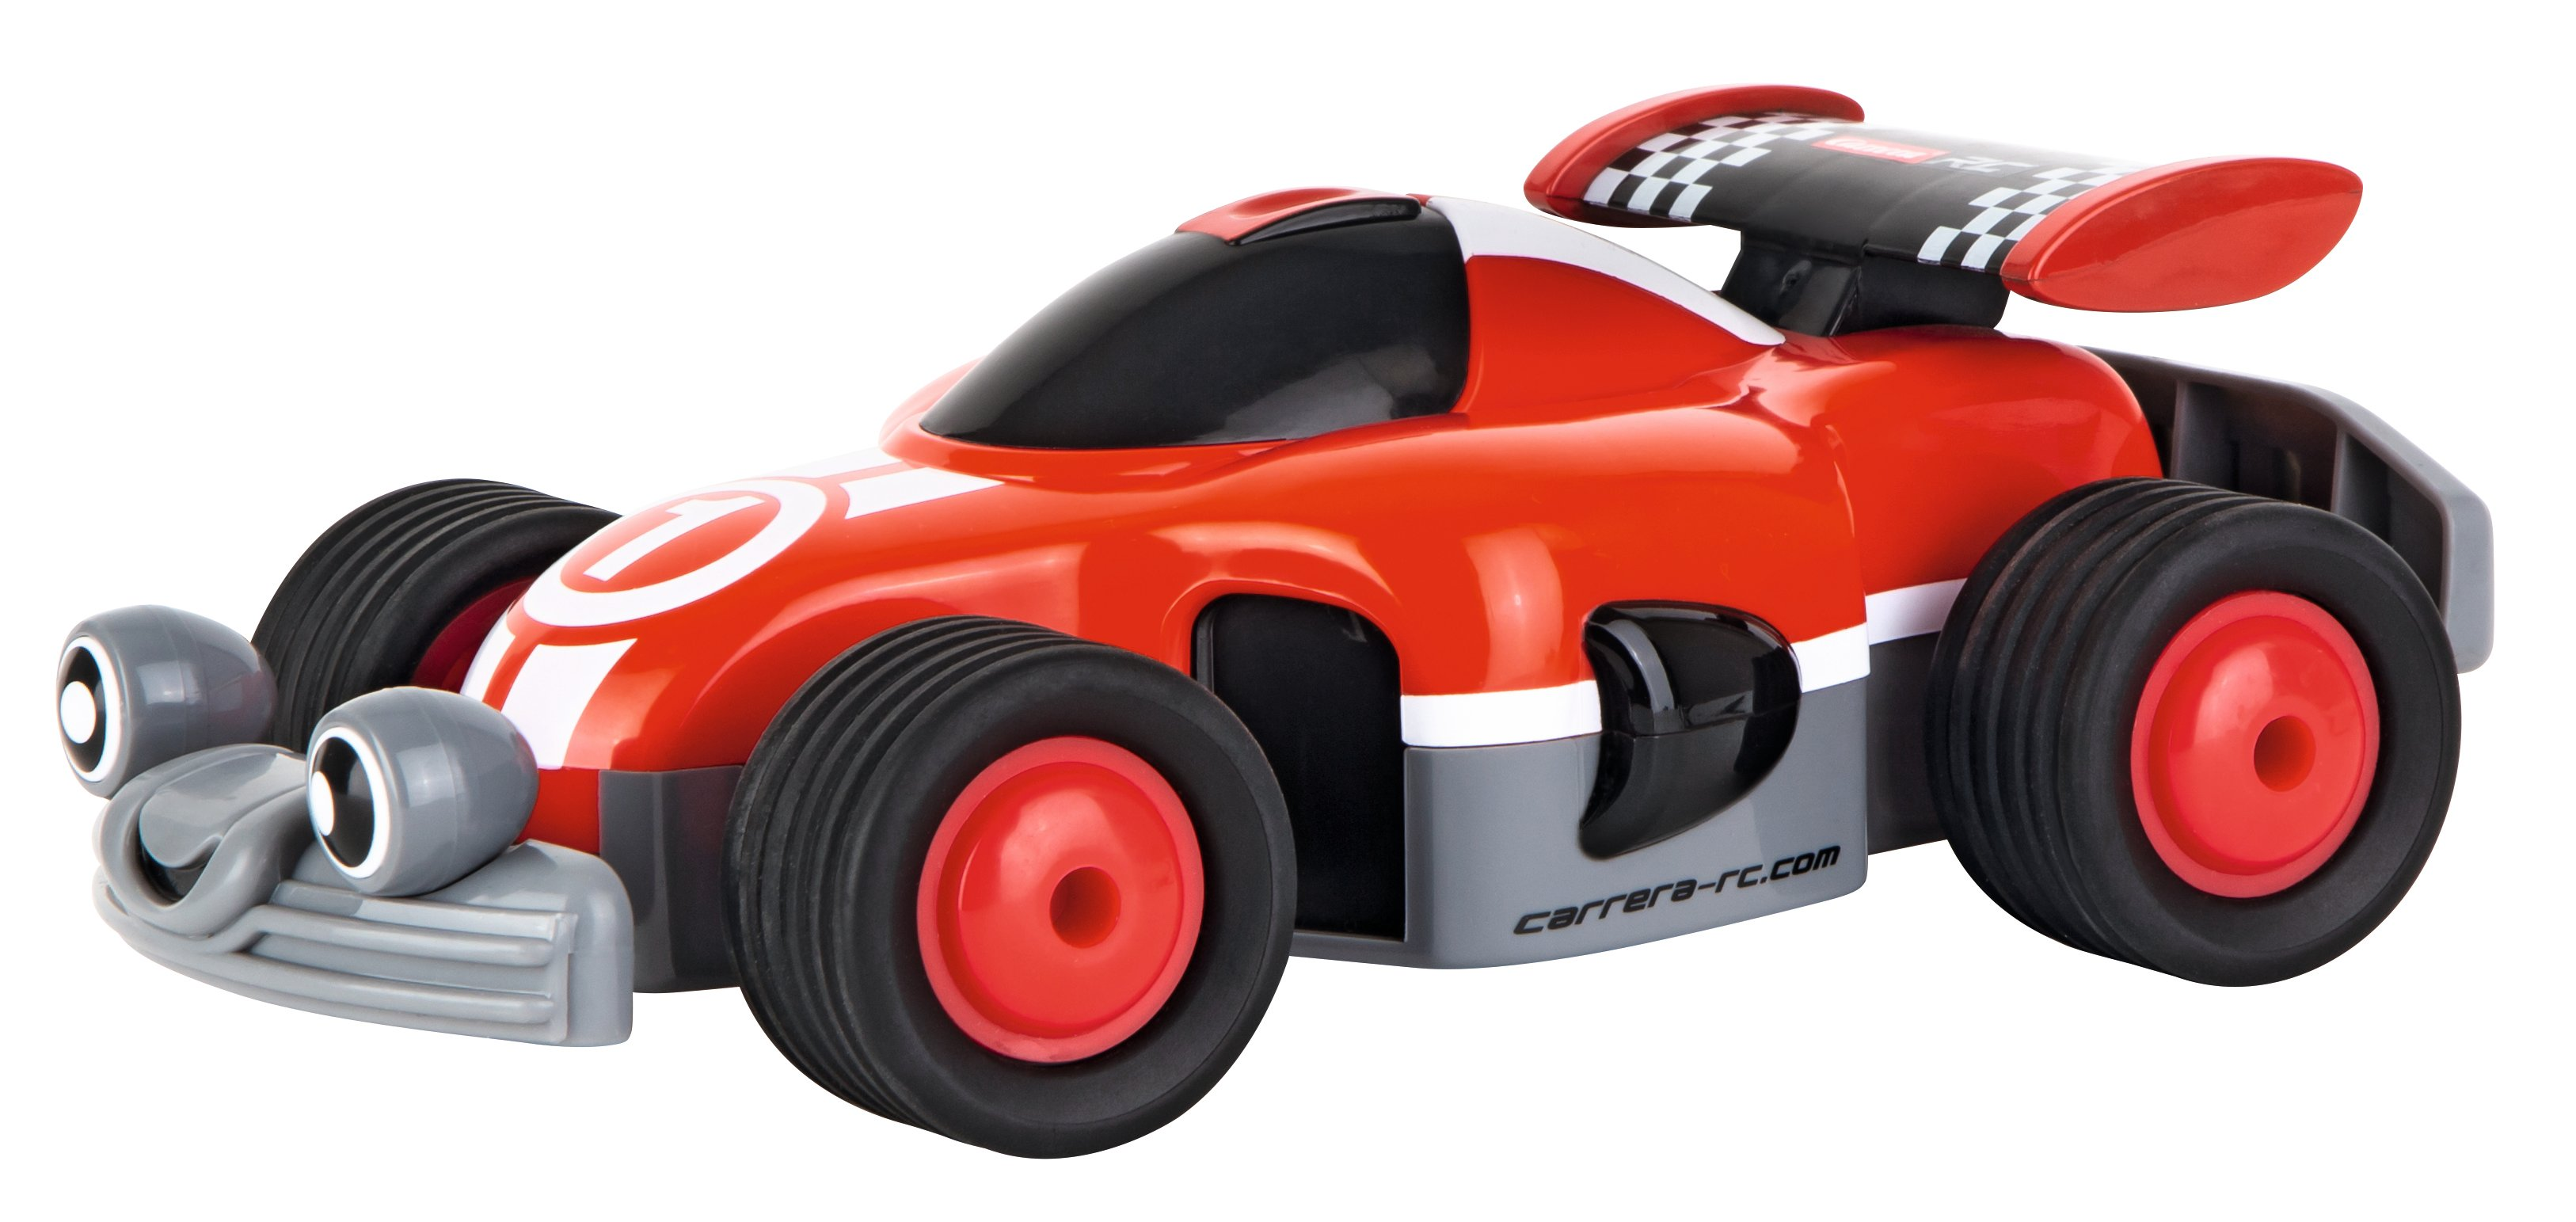 Carrera - First RC 2,4GHZ - Carrera Racer (370181073)